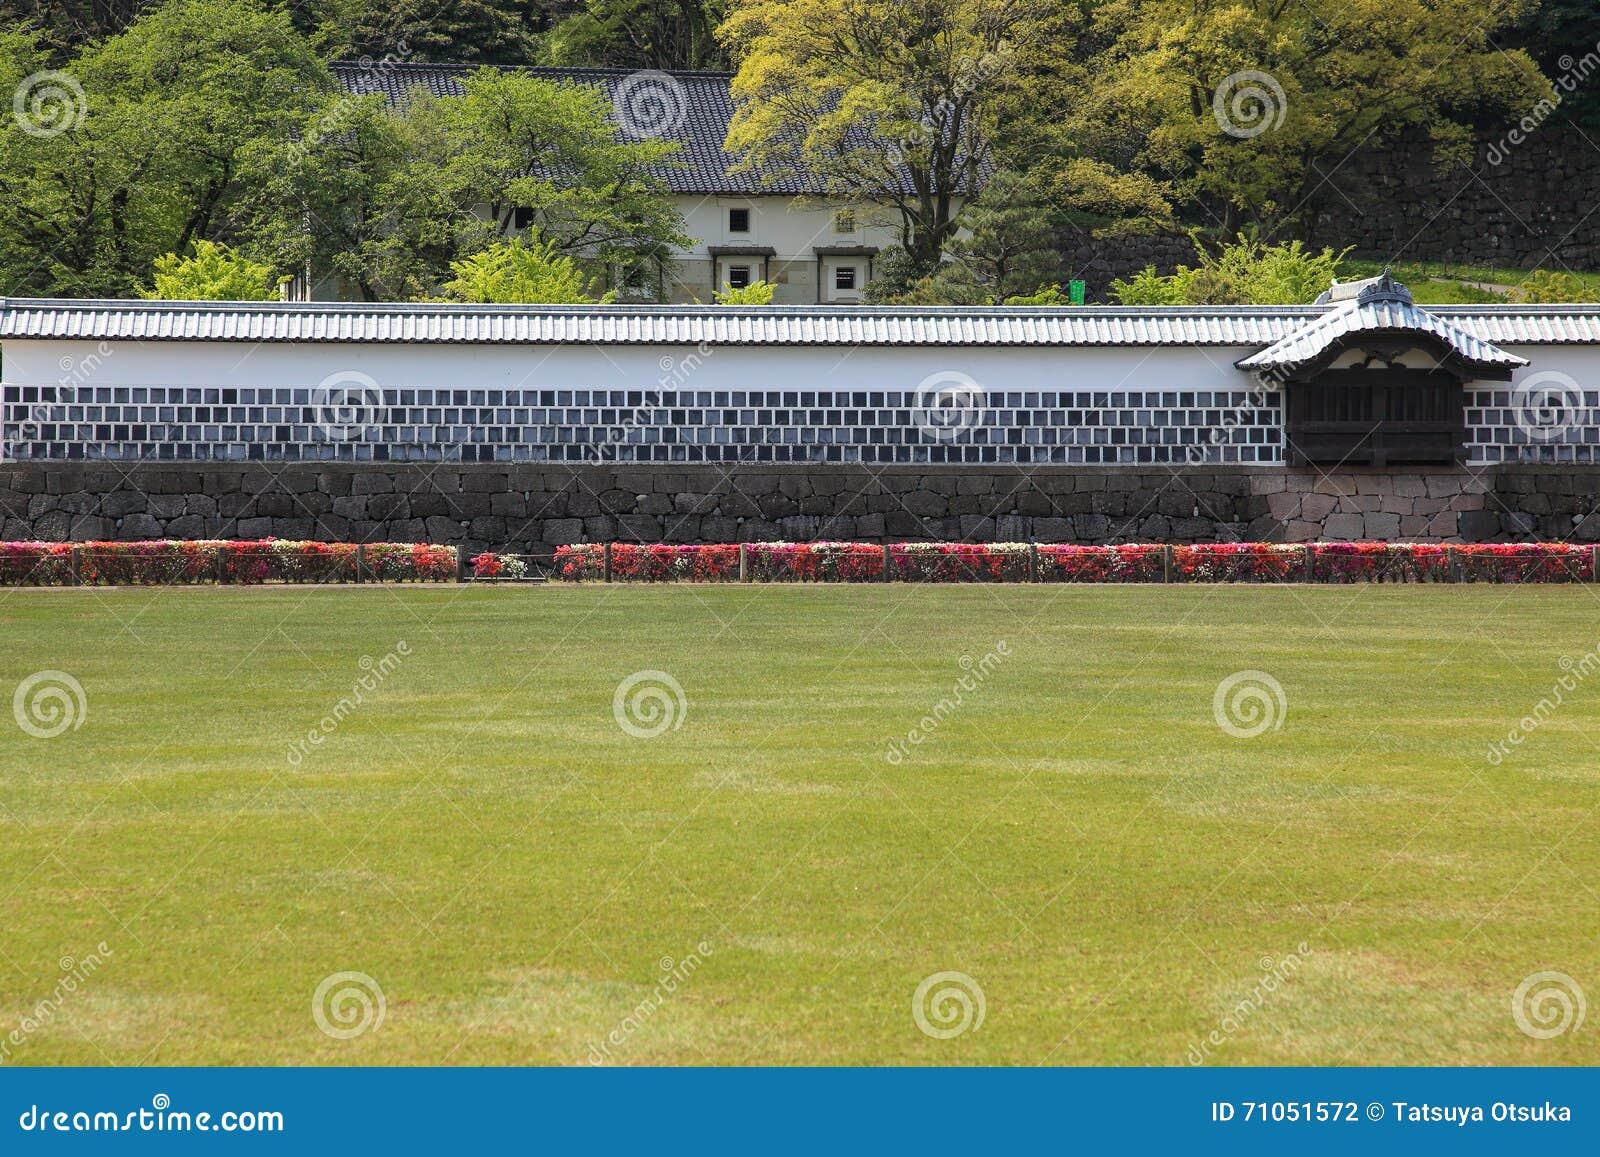 Download Japanese castle wall stock photo. Image of azalea, castle - 71051572